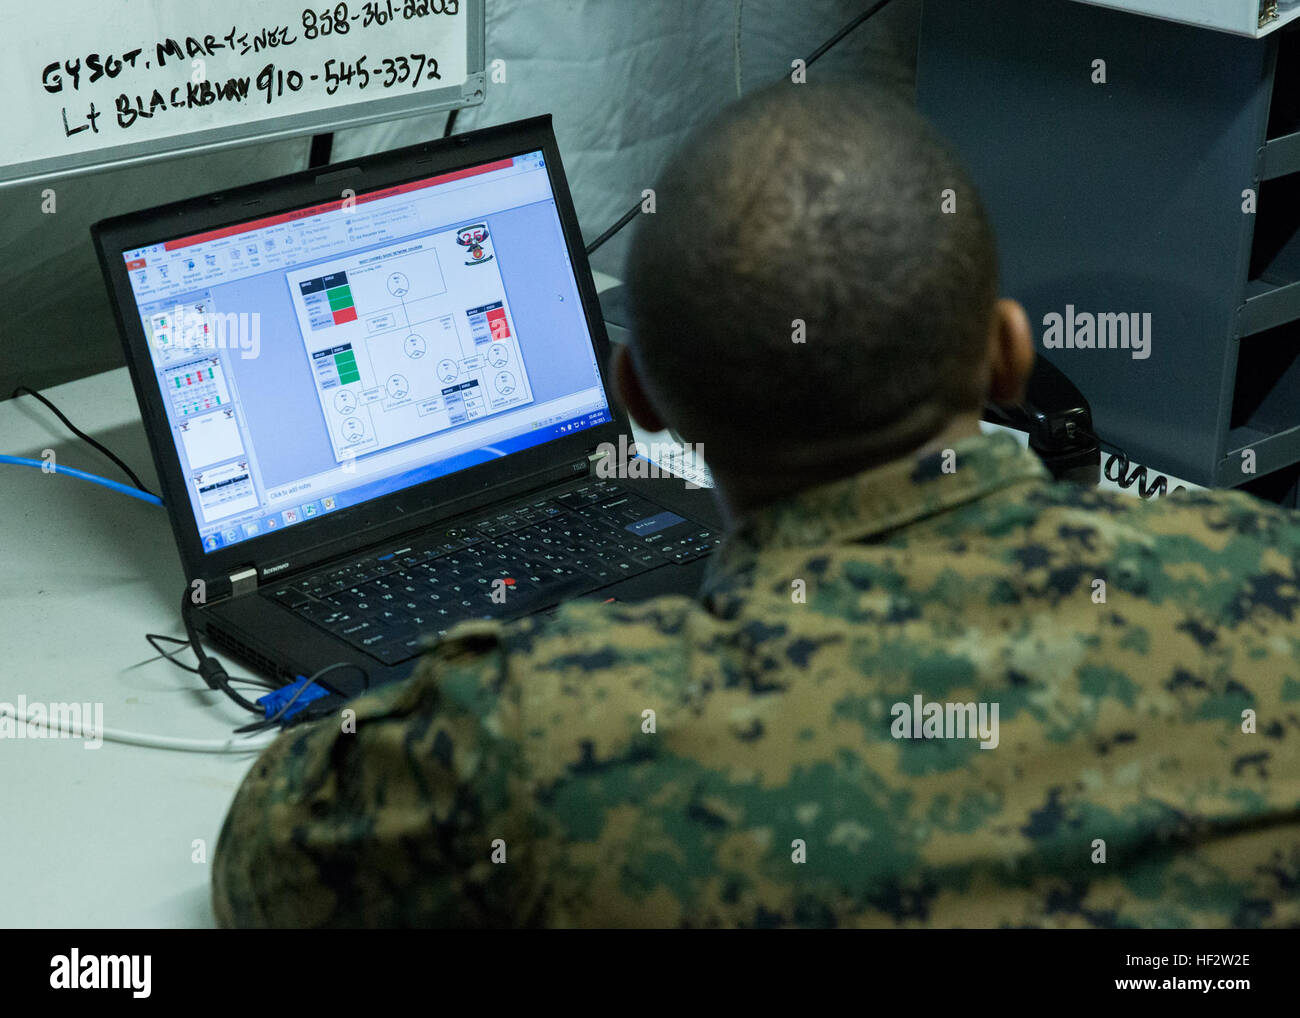 U S Marine Corps Sgt Dalton Stockfotos & U S Marine Corps Sgt Dalton ...